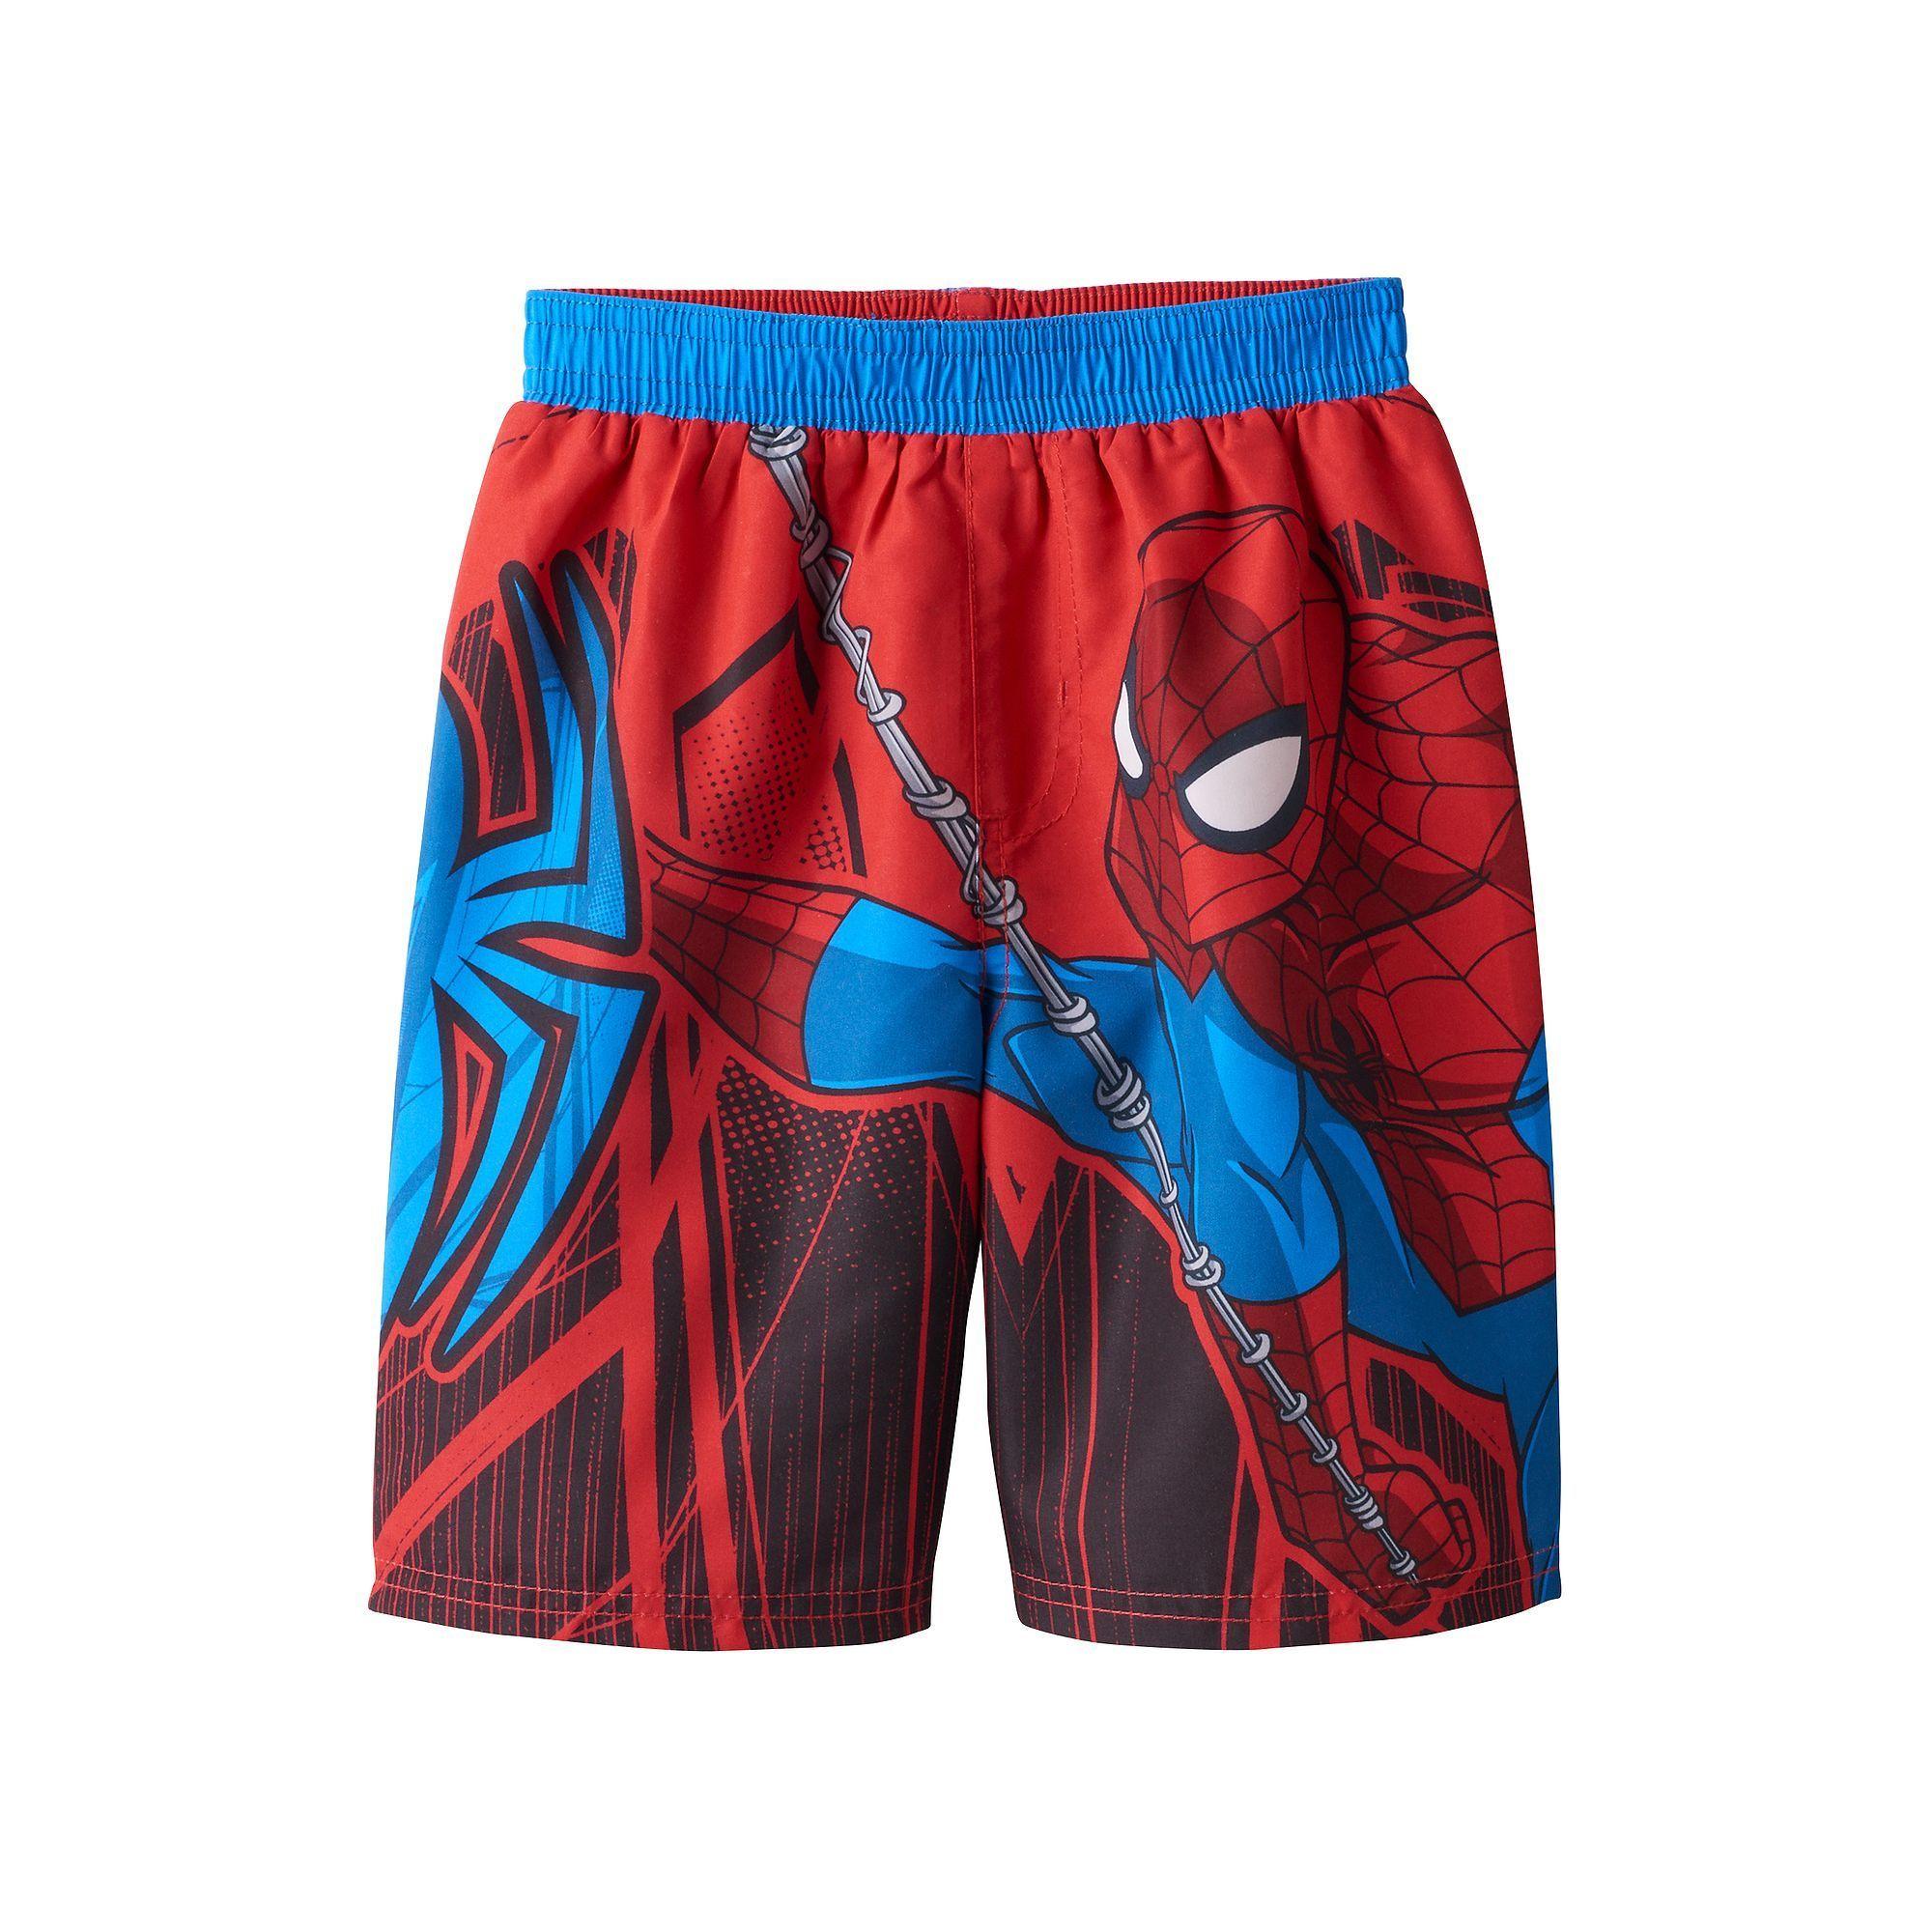 132bf2303b DC Comics Superman Little Boy Swim Trunks Shorts Size 5T Clothing Clothing,  Shoes & Jewelry